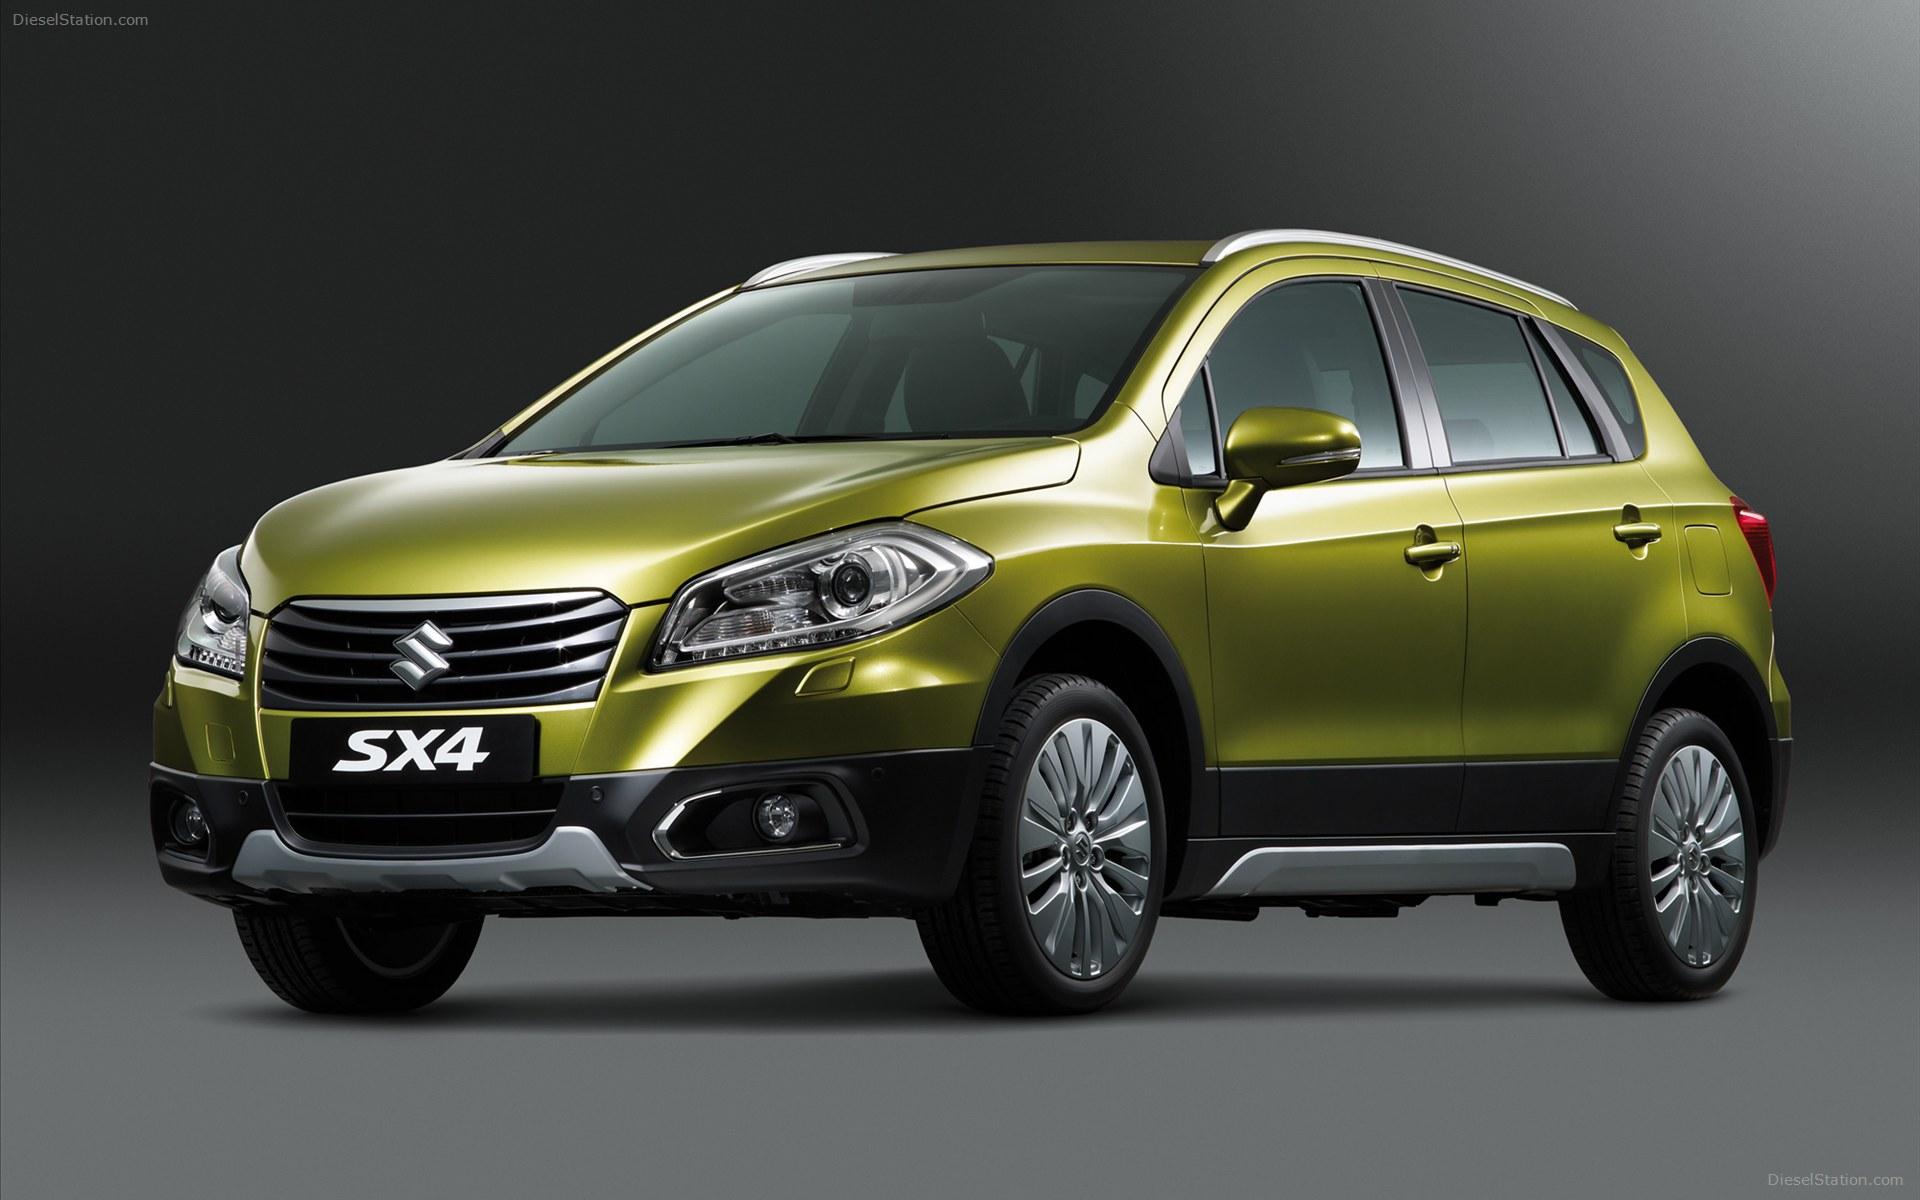 New 2014 Suzuki SX4 Crossover